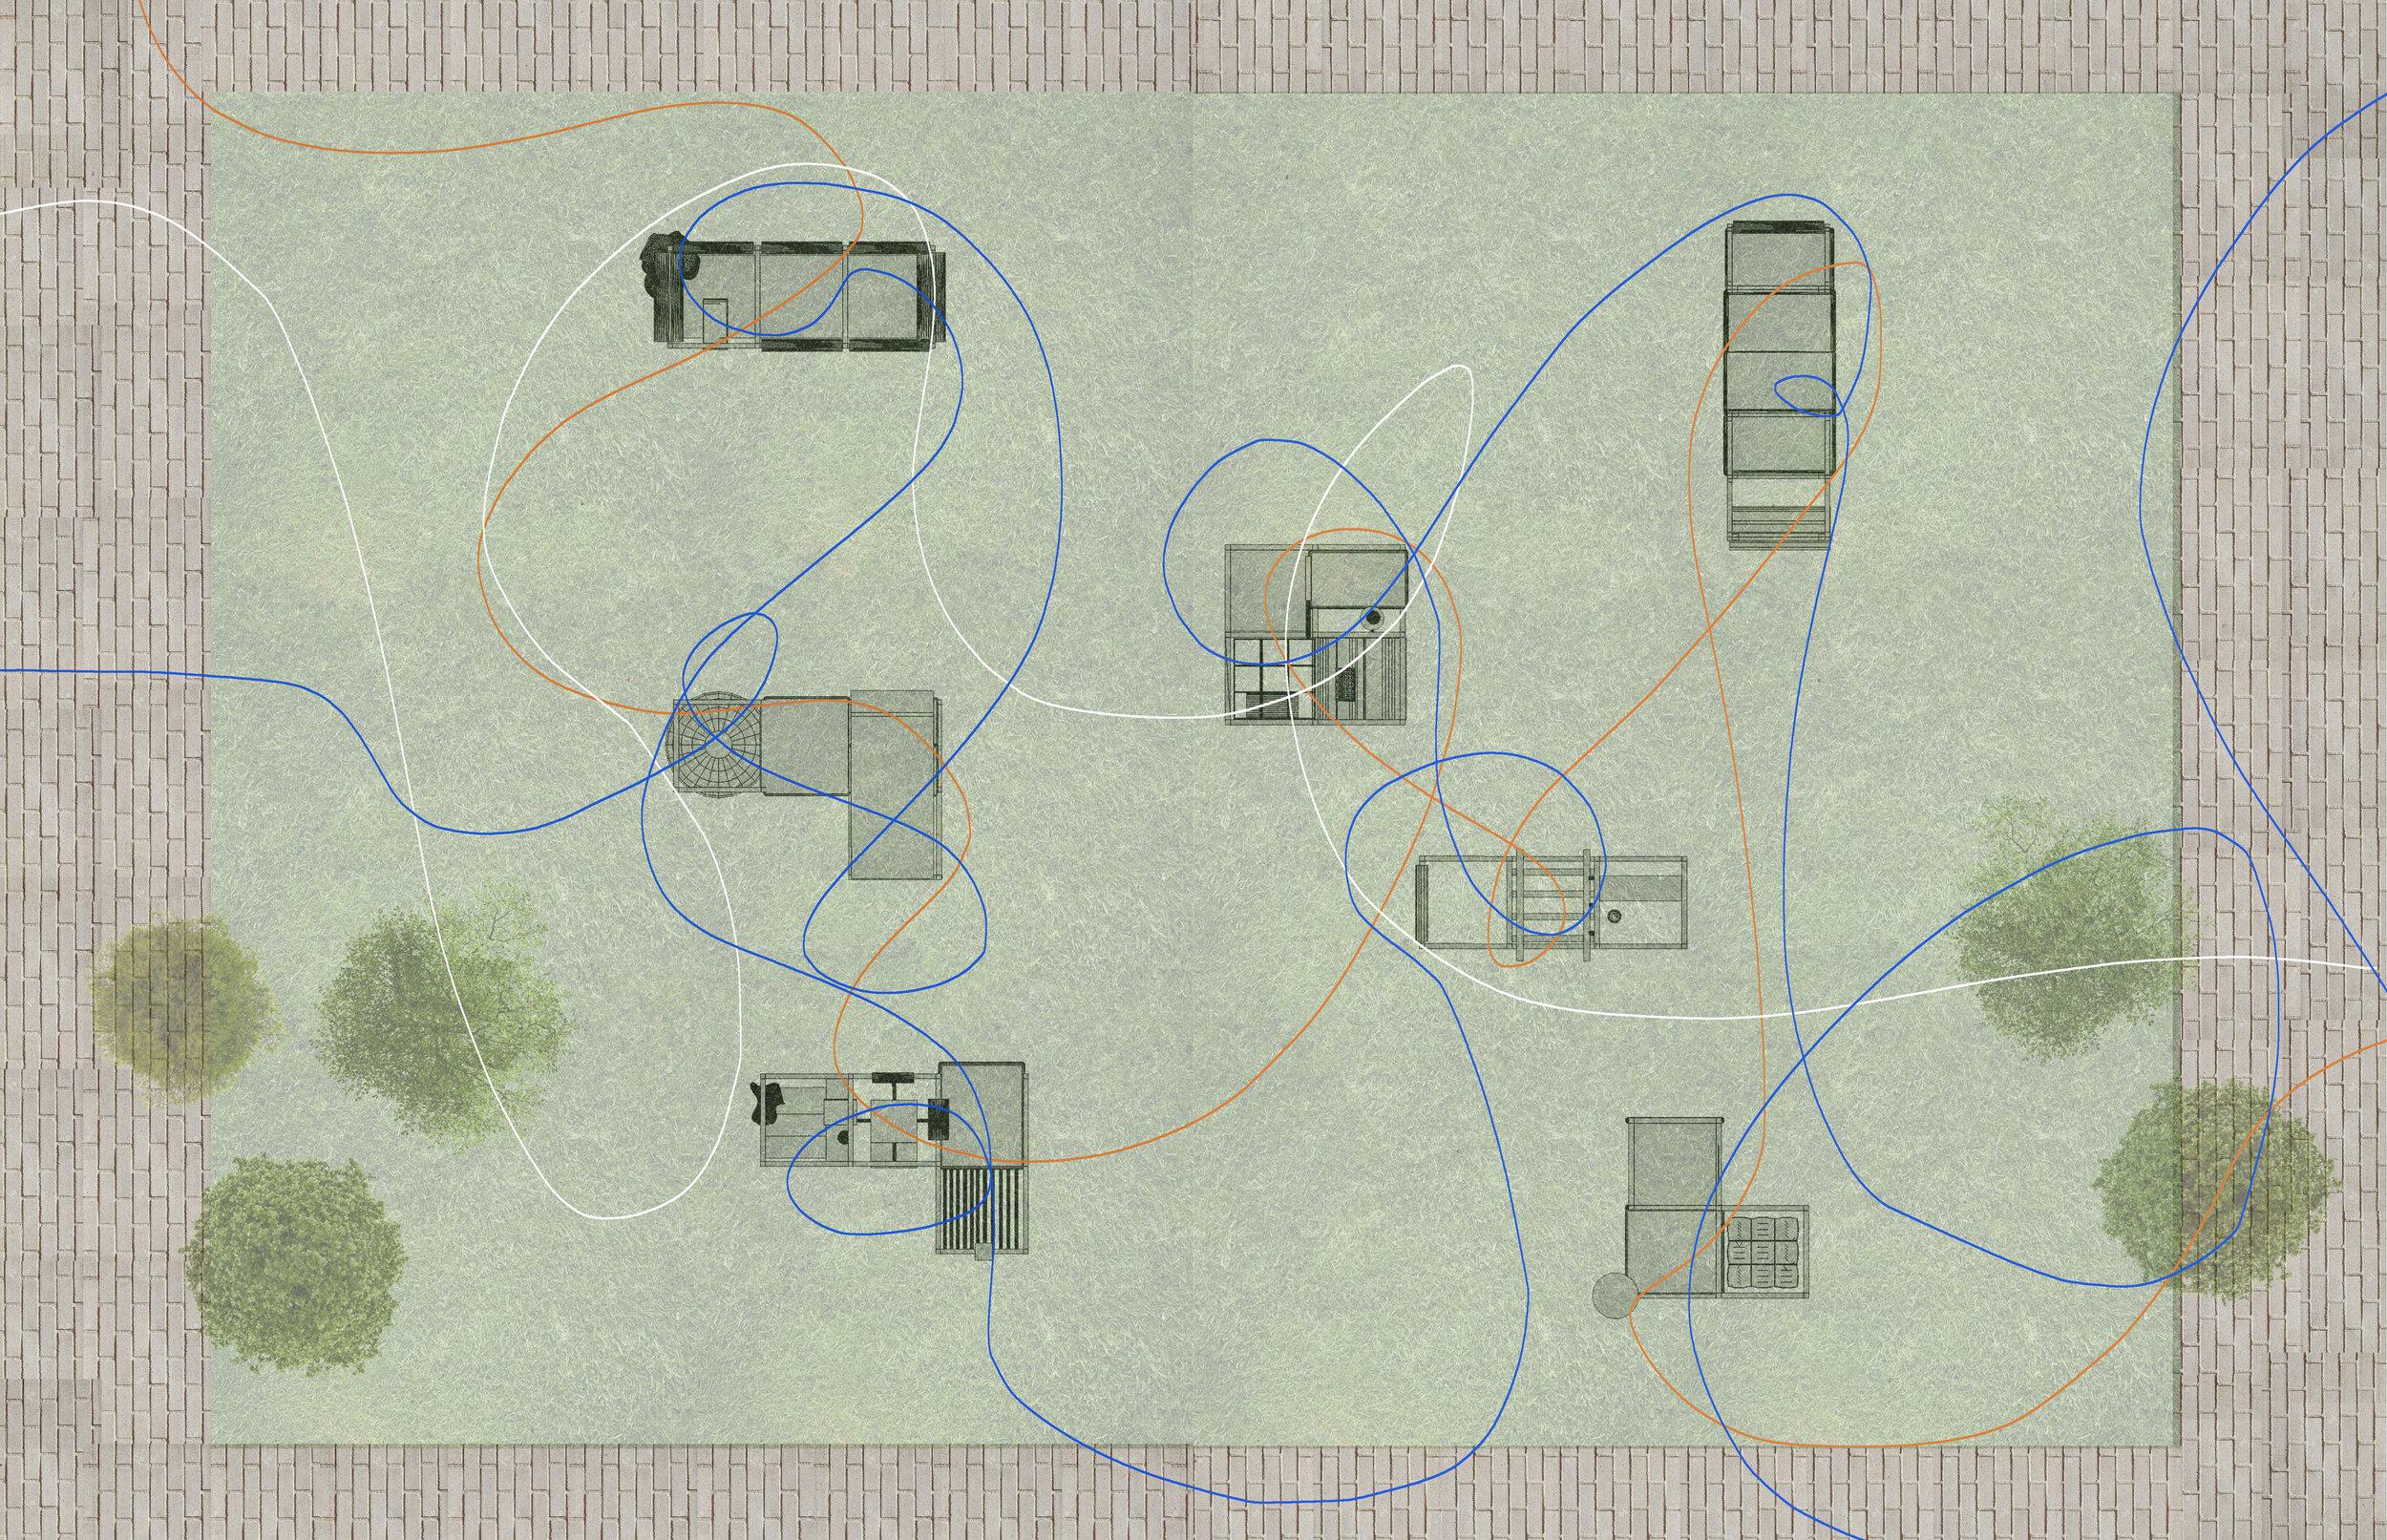 plan-and-movement-final.jpg